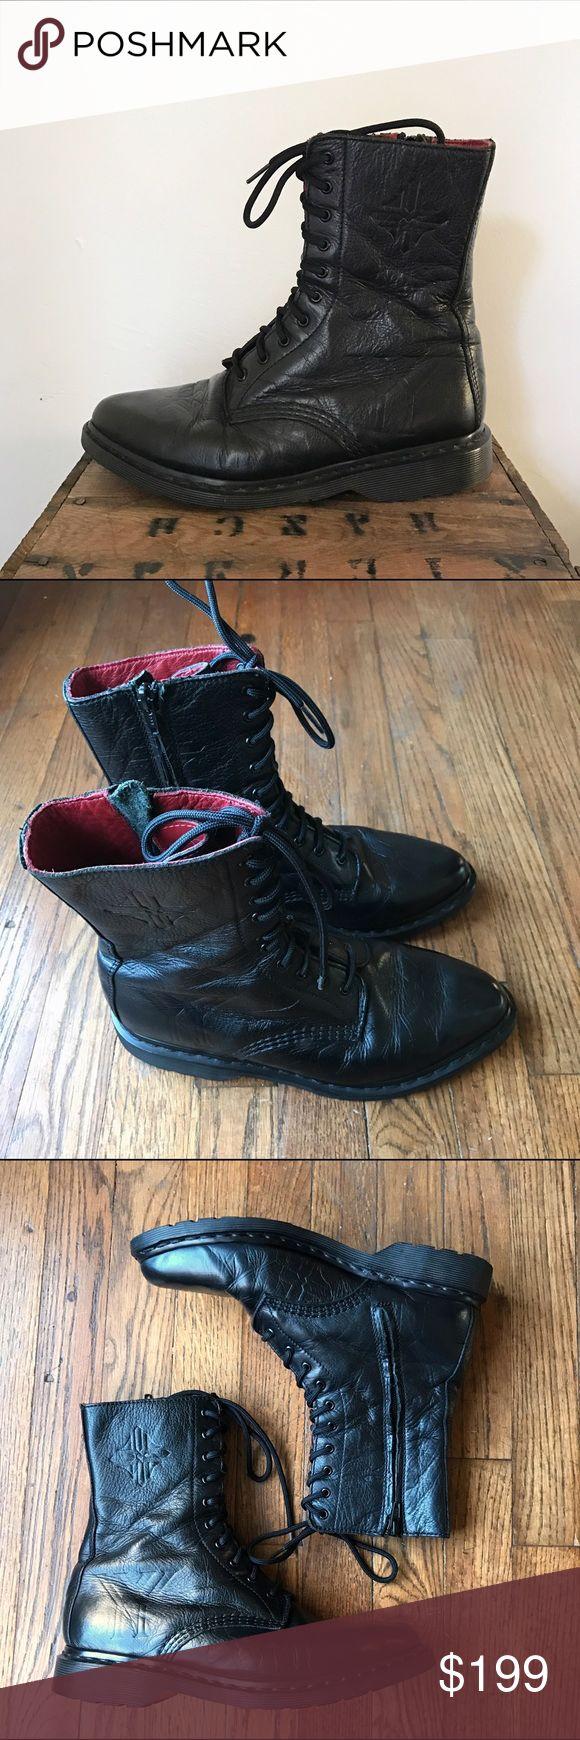 Dr. Martens for Yohji Yamamoto Combat Boots Dr. Martens for Yohji Yamamoto Combat Boots in black. Very well taken care of, rarely worn. Size 8. Yohji Yamamoto Shoes Combat & Moto Boots